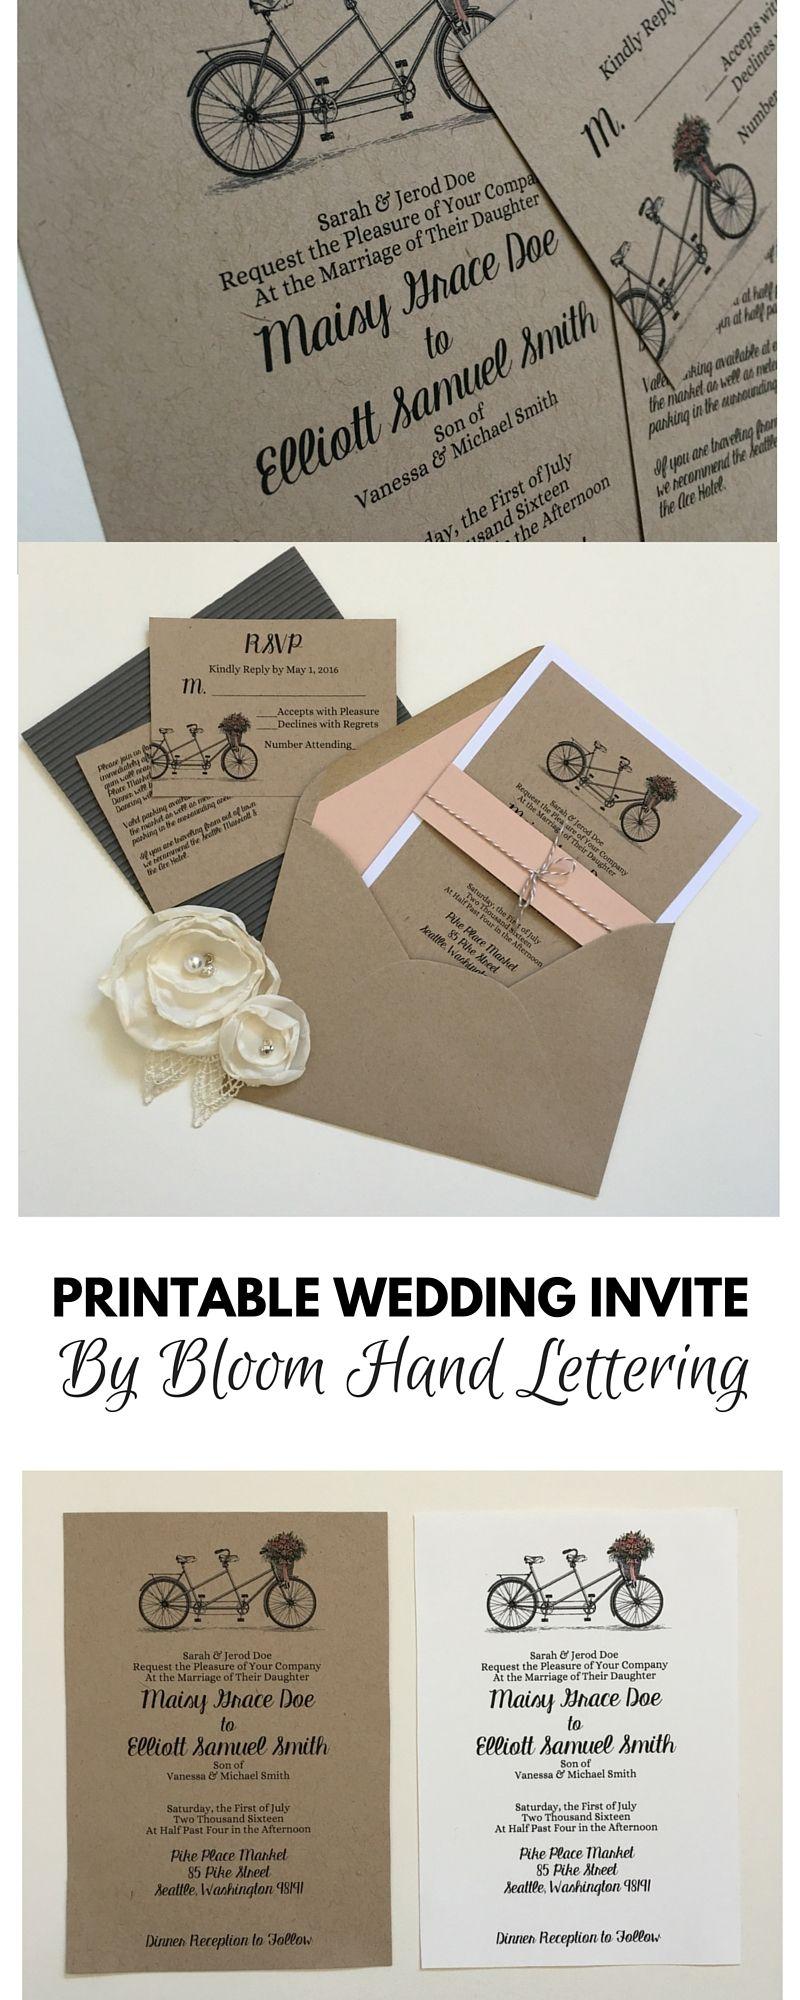 Inexpensive Wedding Invitation, Rustic Template Download, Printable ...